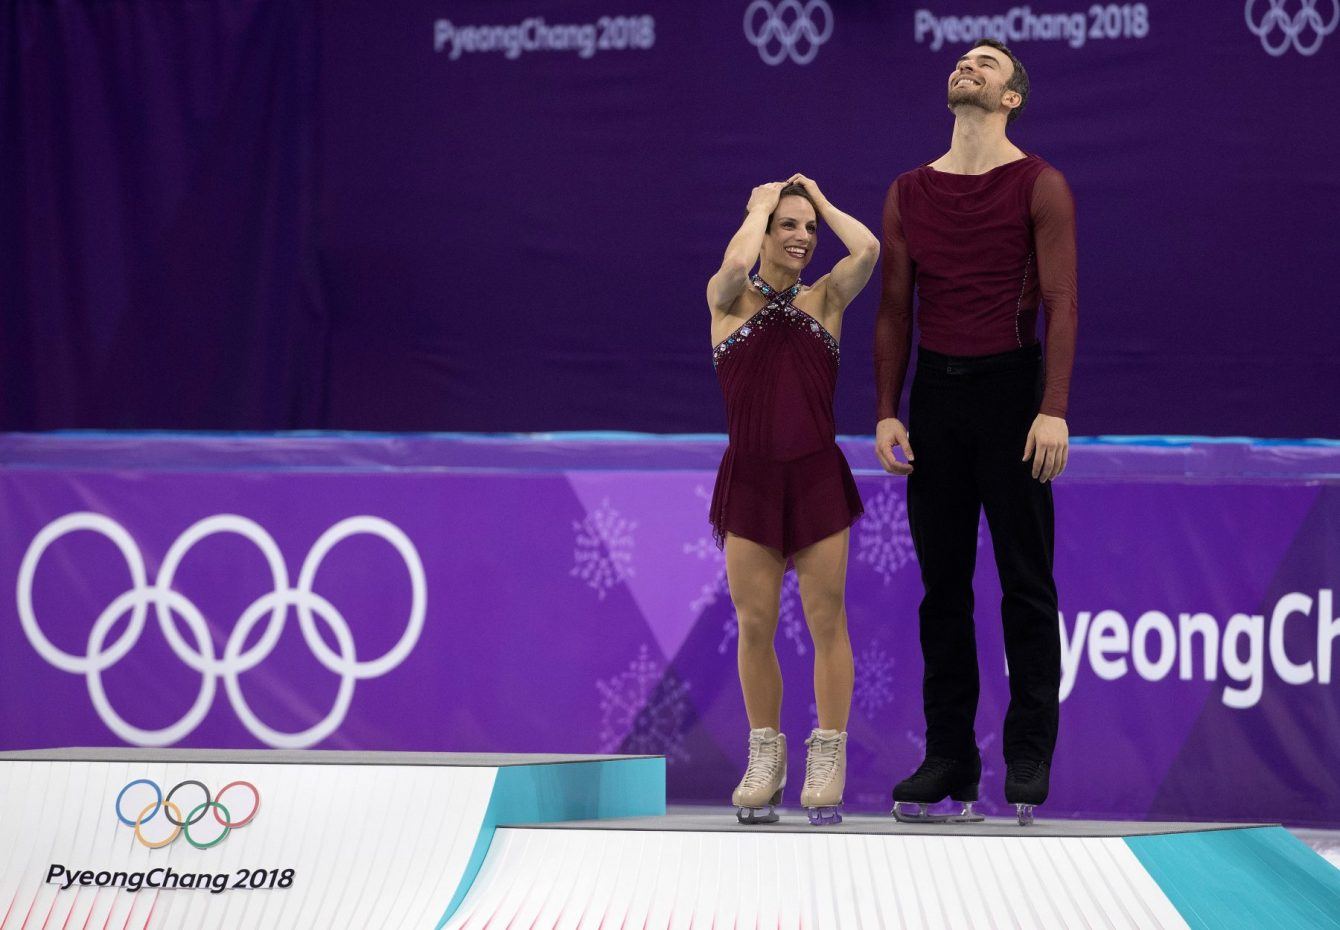 Team Canada Duhamel Radford PyeongChang 2018 pairs free podium